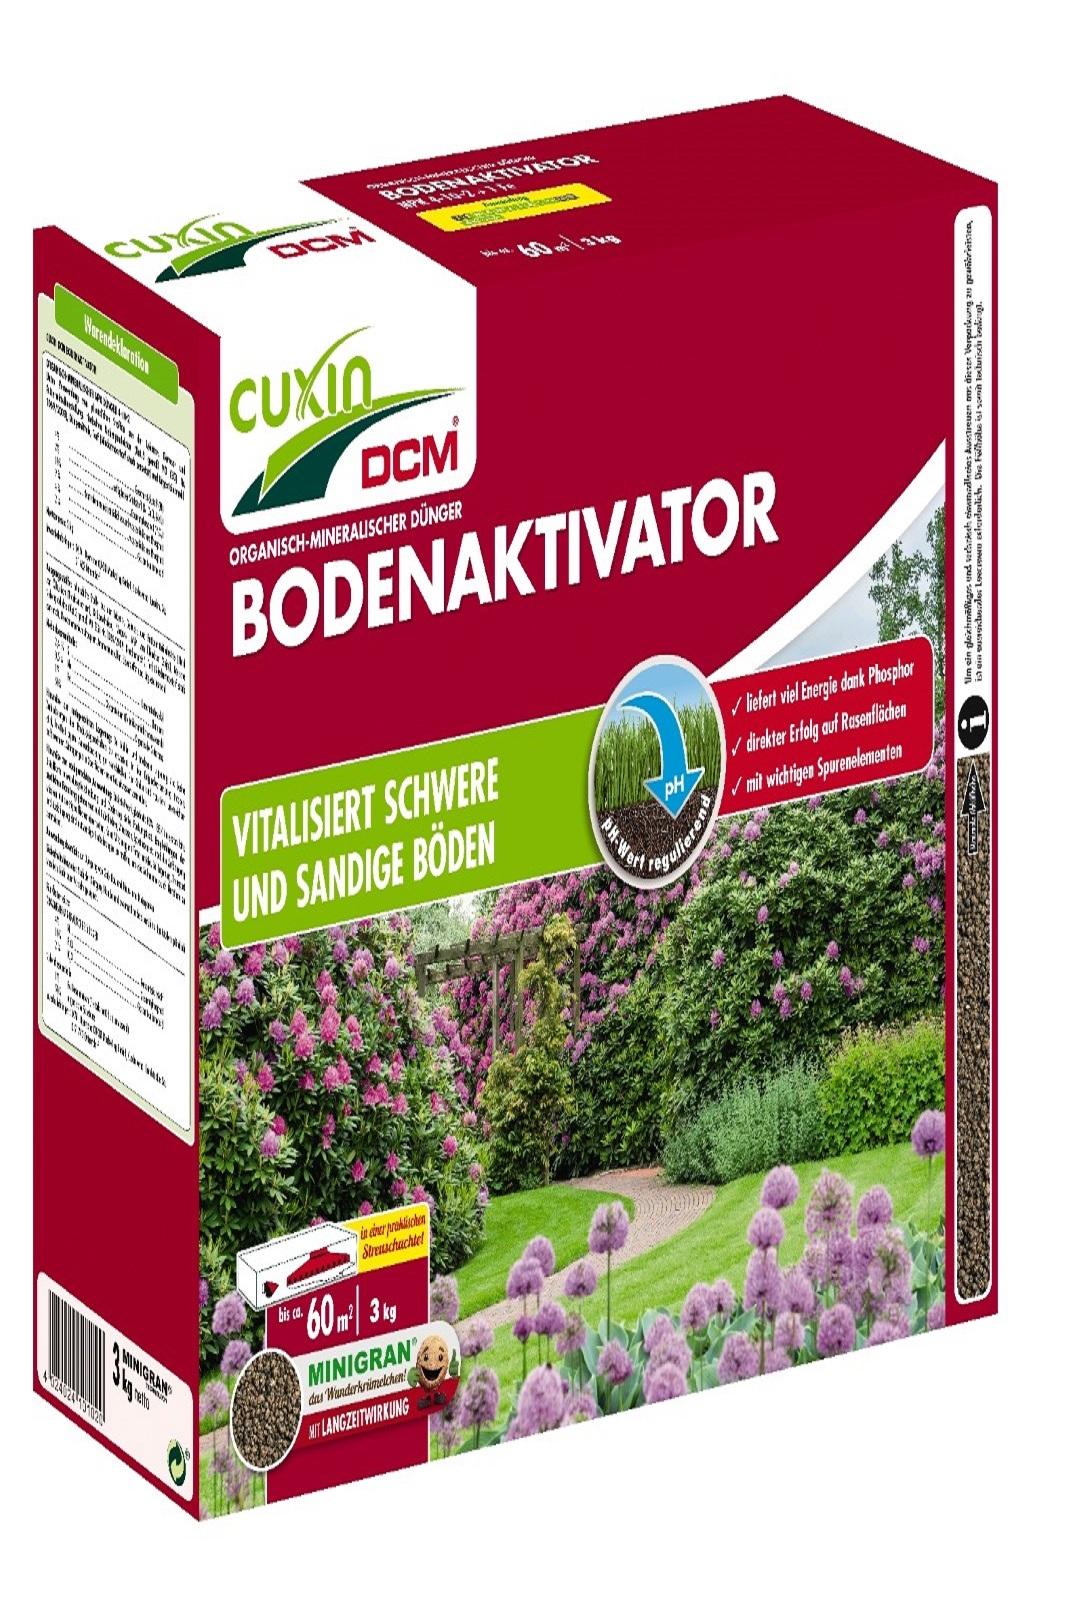 Cuxin Bodenaktivator Bodenvitalisierung Bodenhilfe Bodenhilfstoff  3,0kg